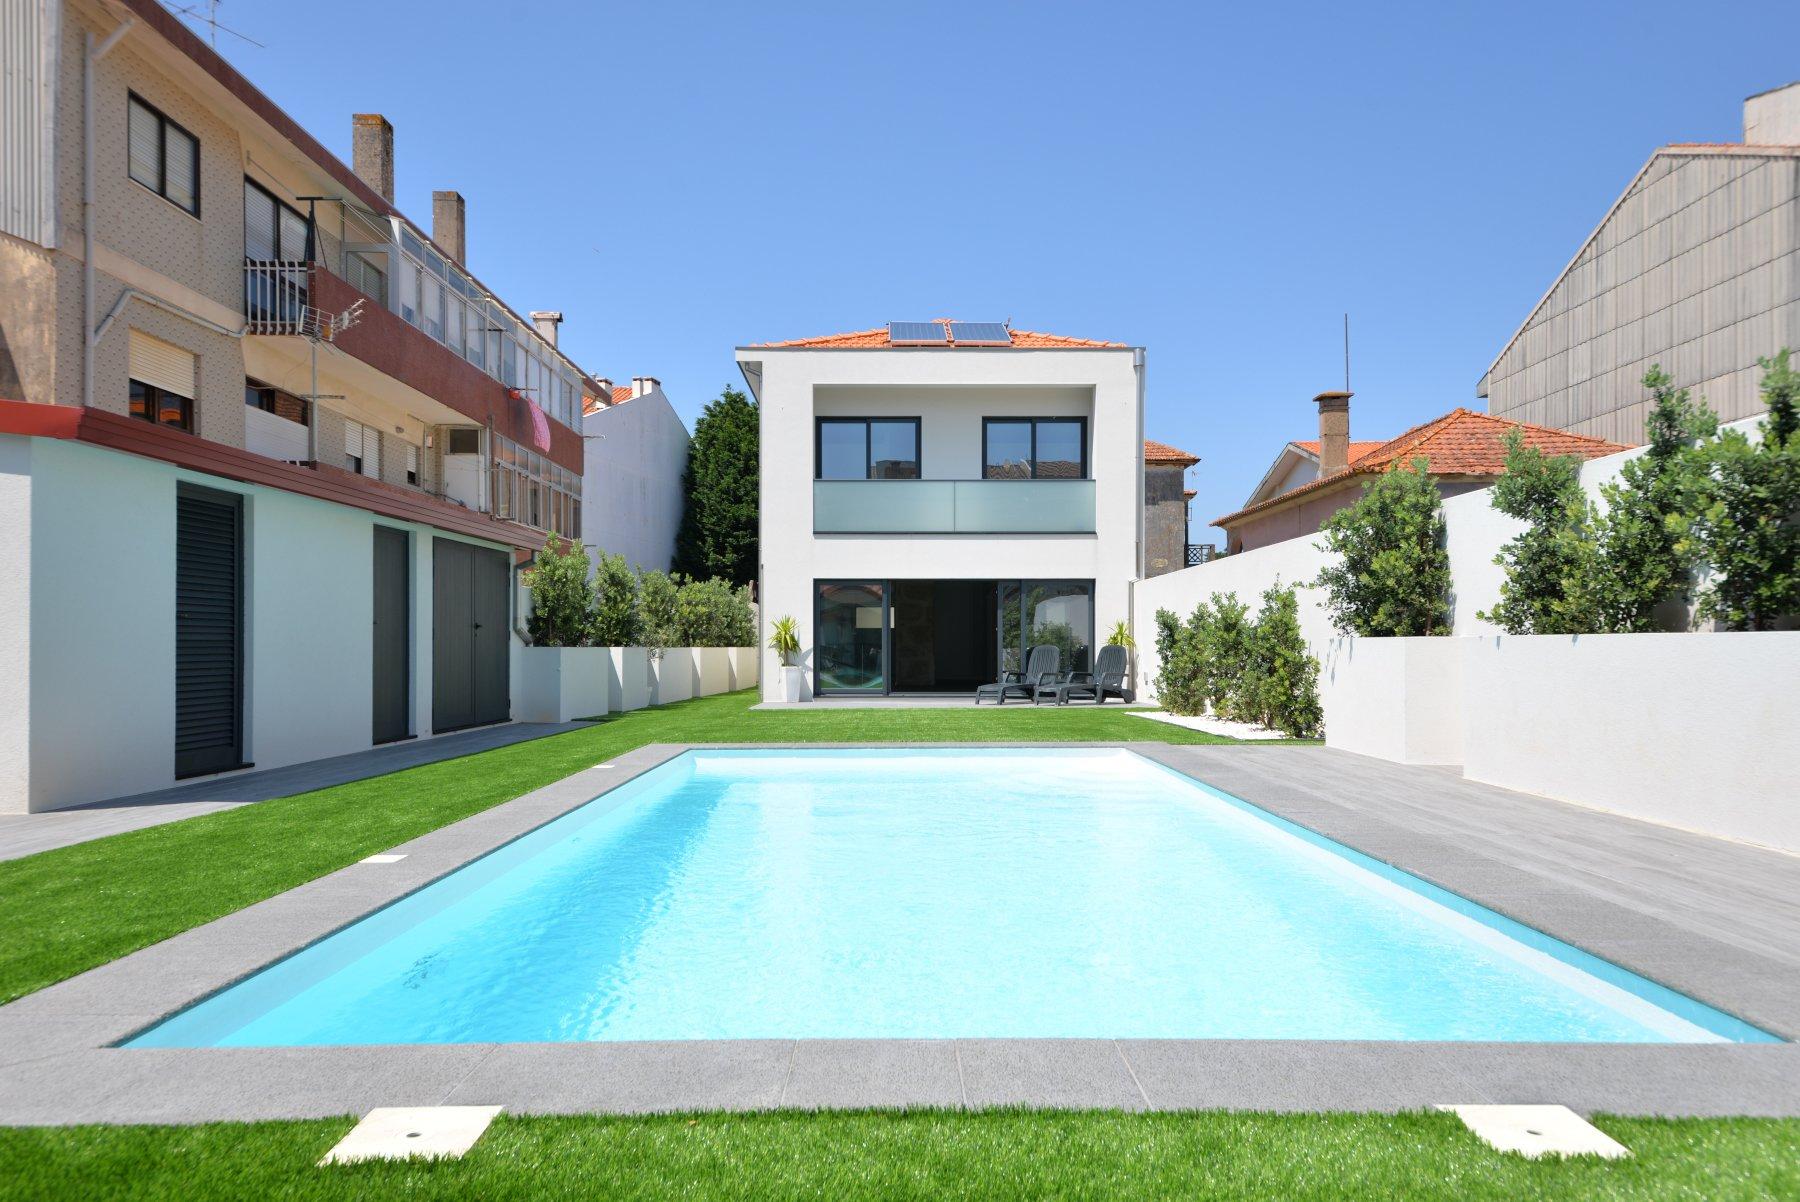 3 Bedroom Villa Espinho, Porto Ref: AVP41